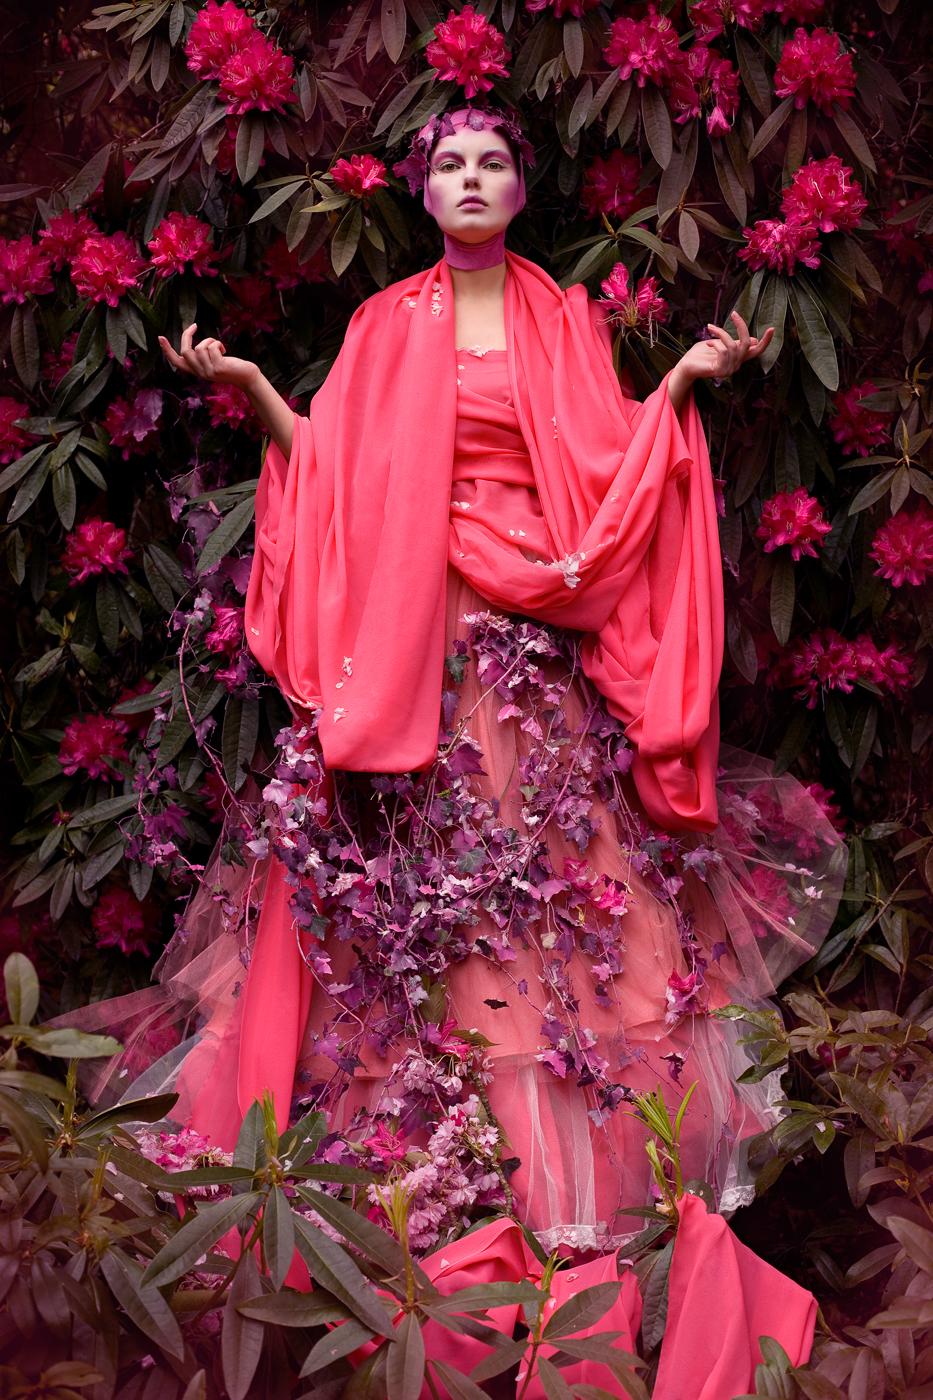 The Pink Saint